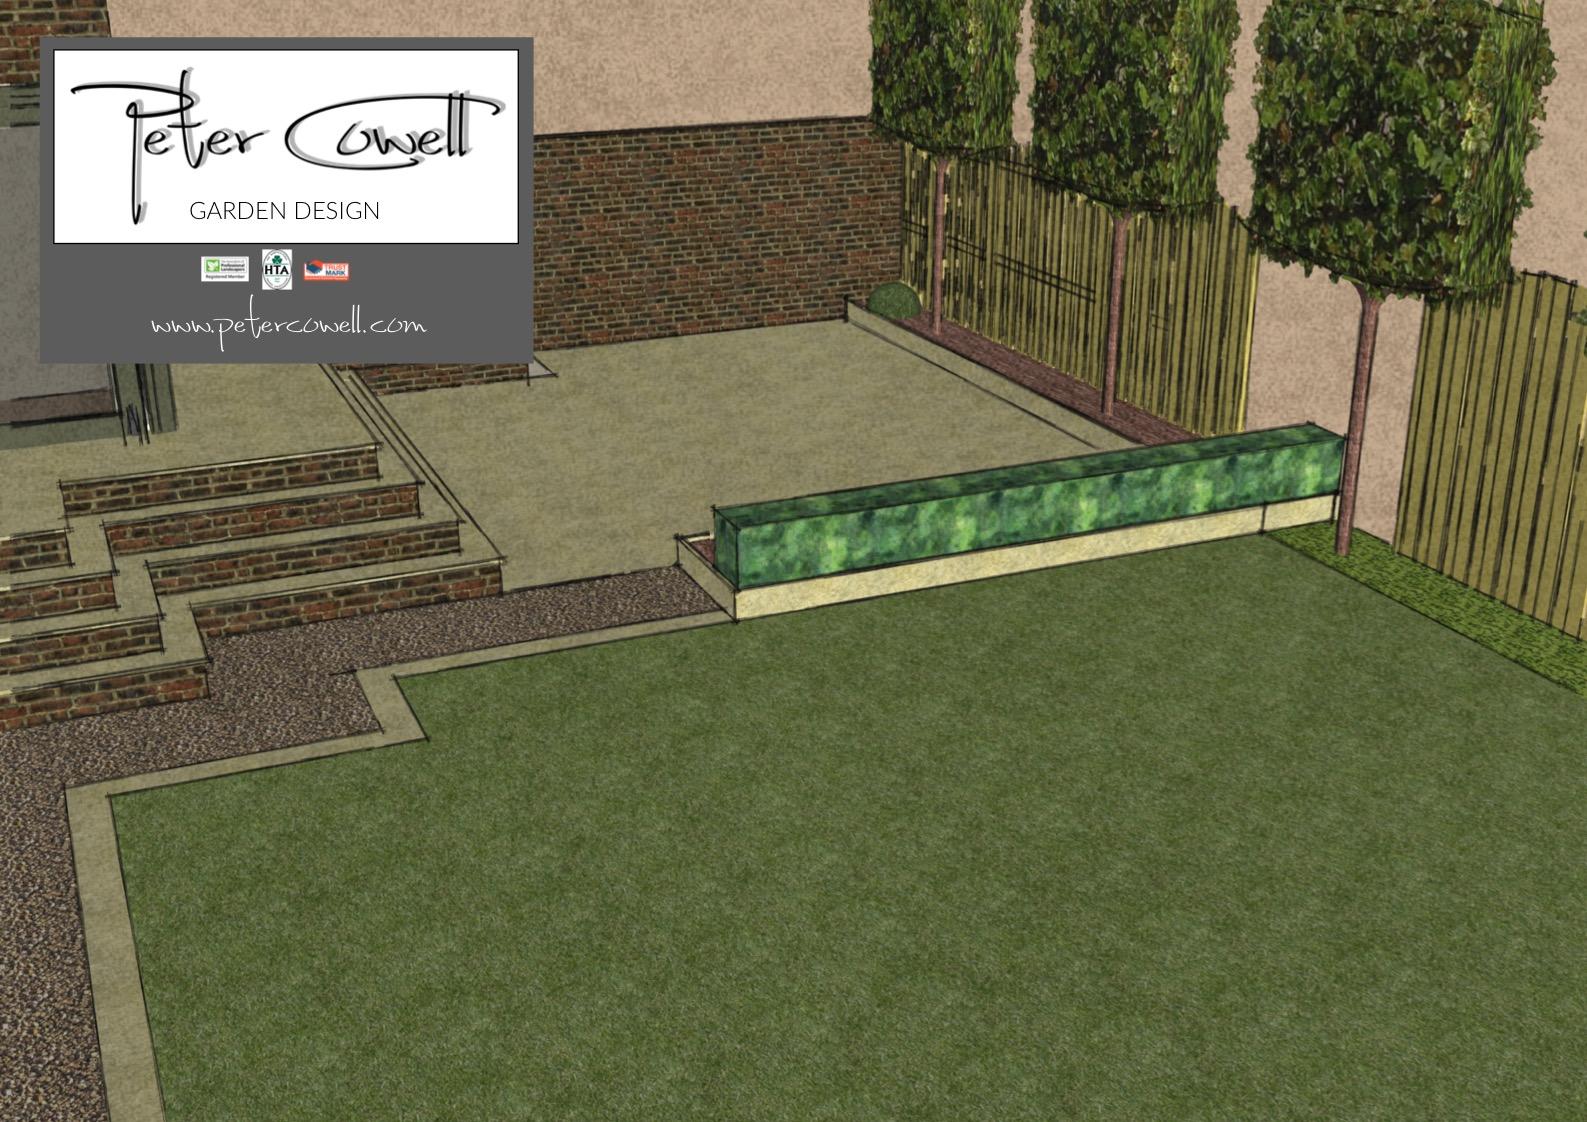 designs_05.jpg